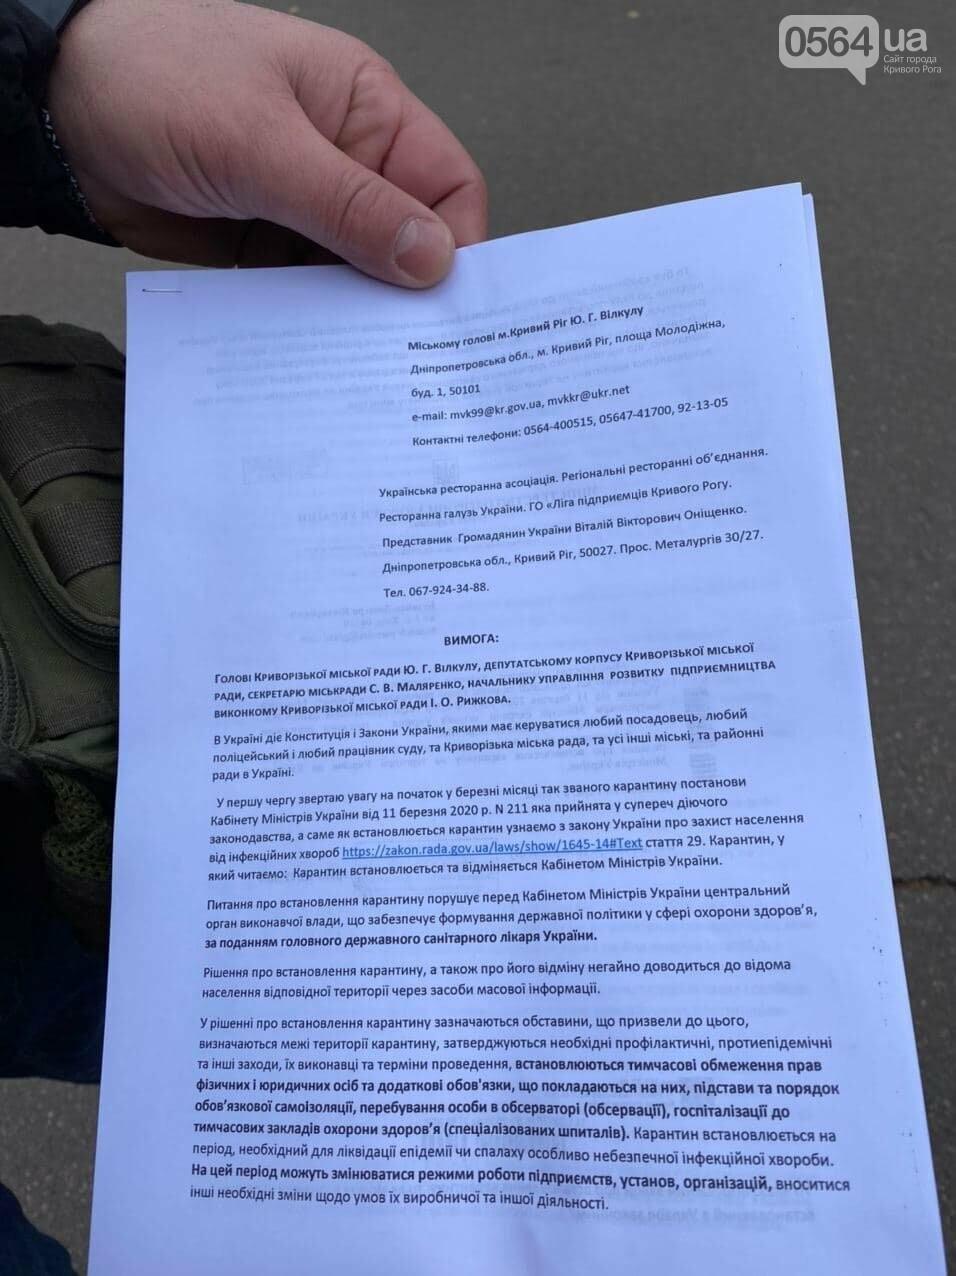 Представители малого бизнеса продолжили протест возле мэрии Кривого Рога, - ФОТО, ВИДЕО, фото-1